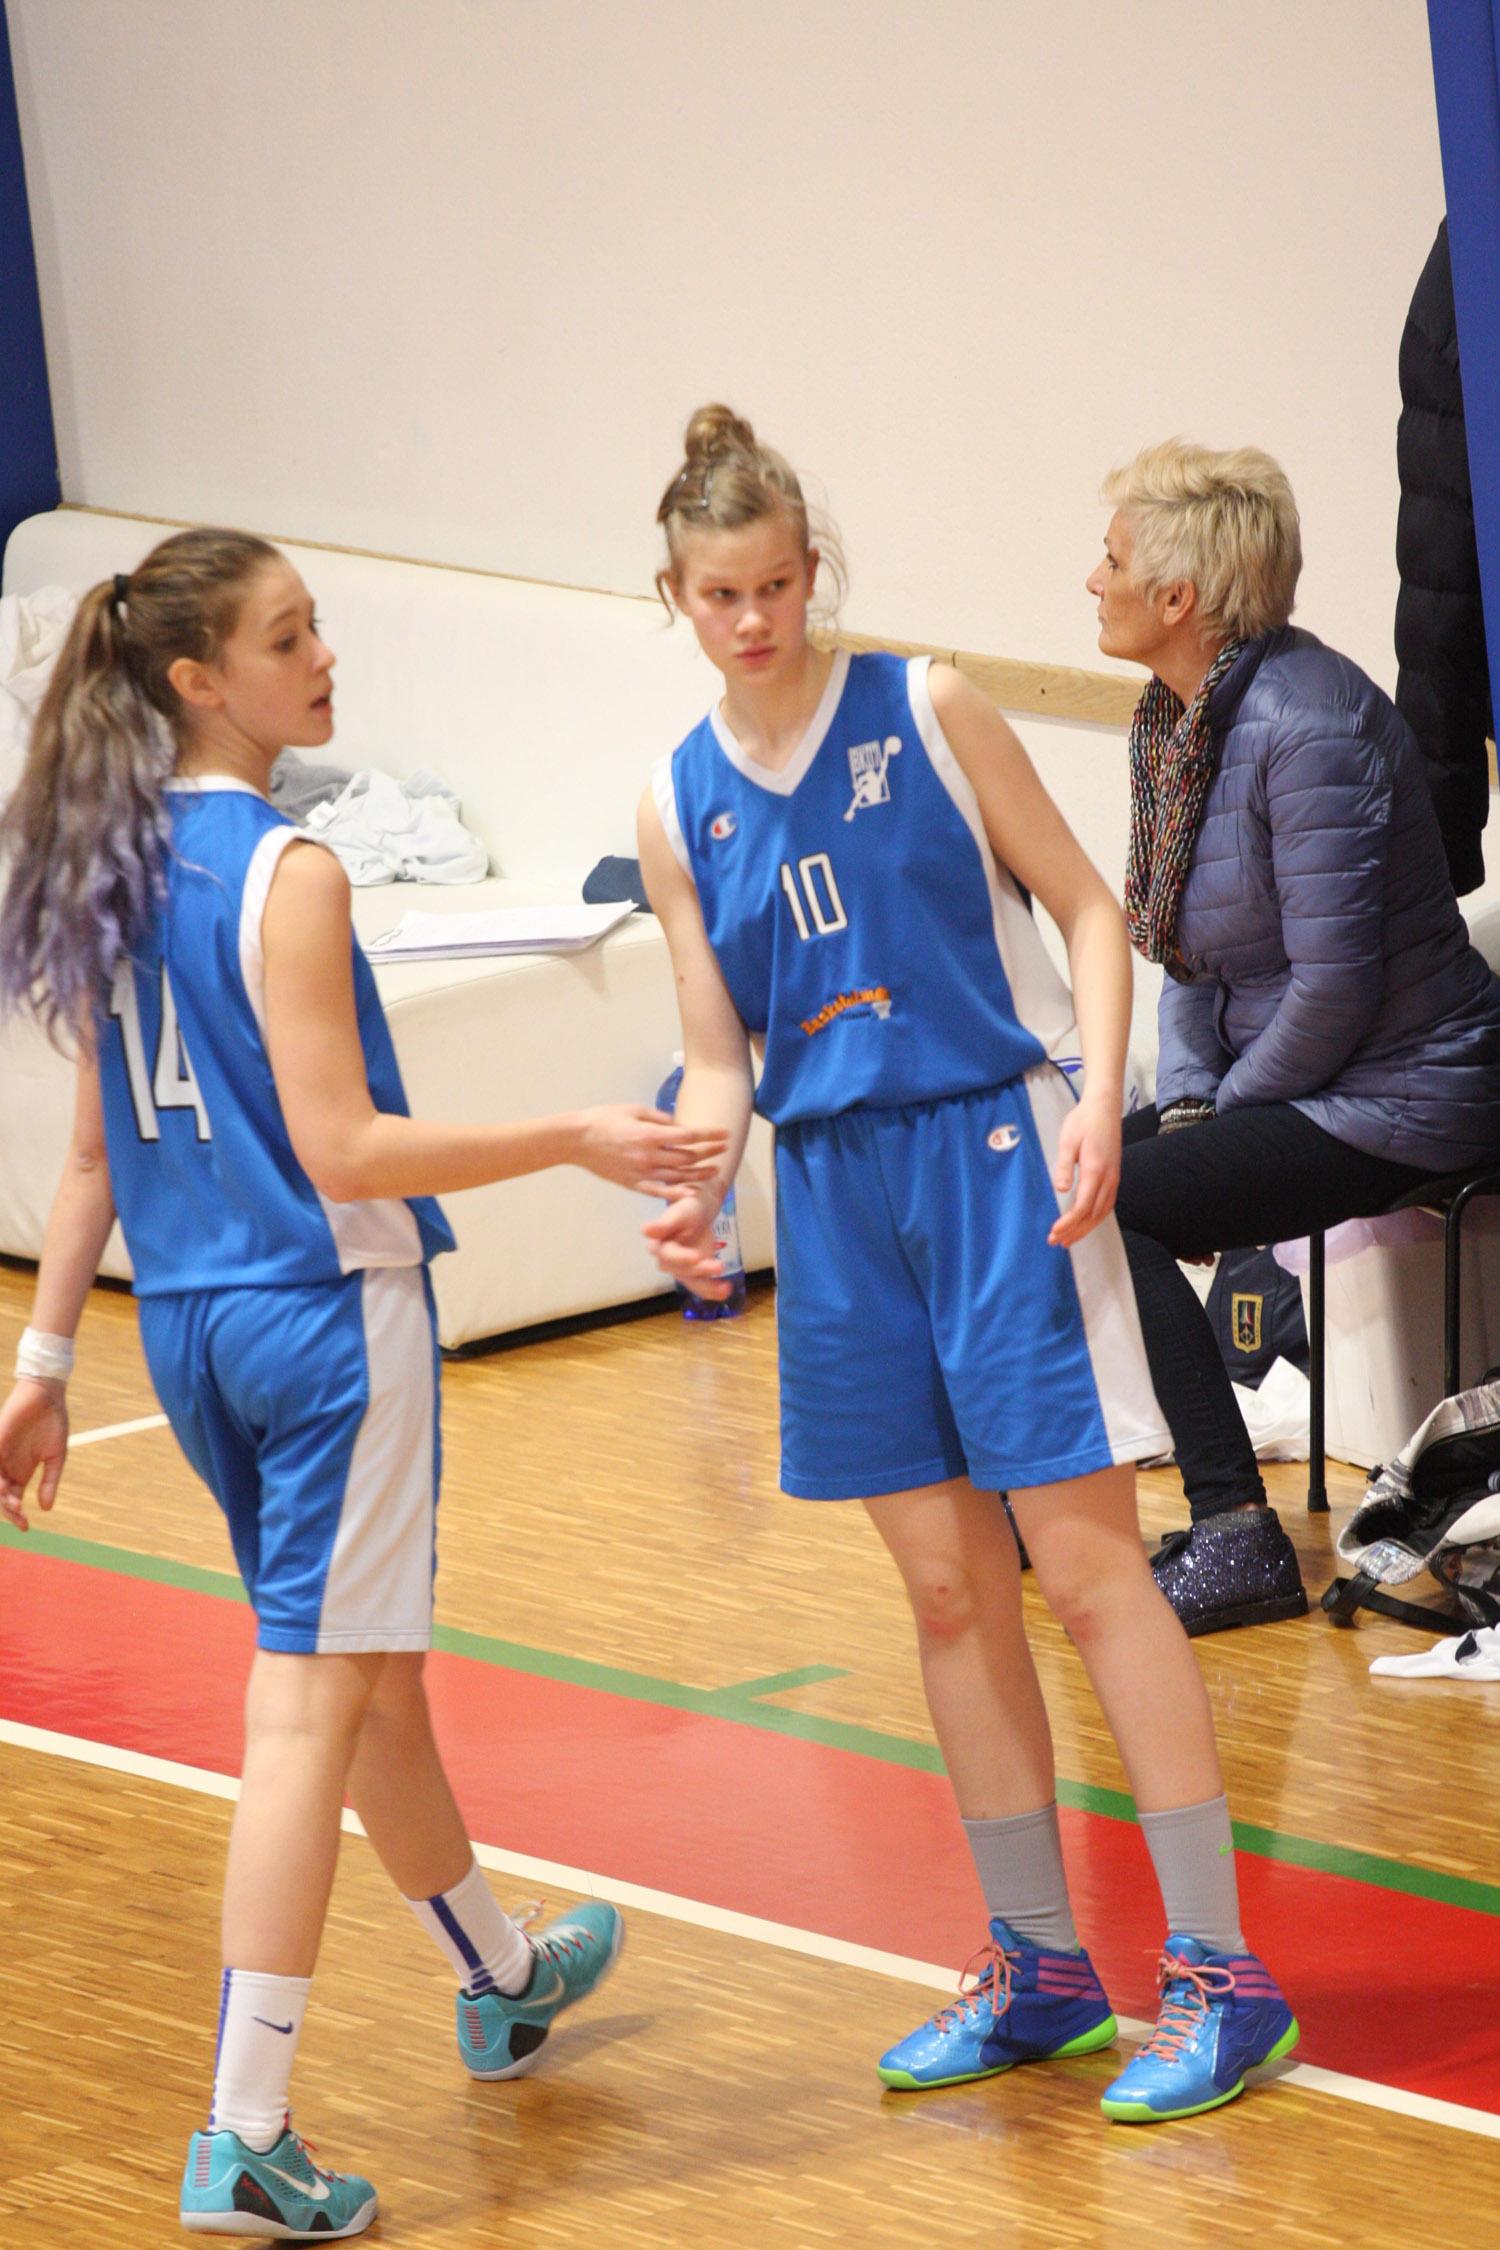 U16E - Costa Masnaga vs Baskettiamo Vittuone 2001 00039.jpg